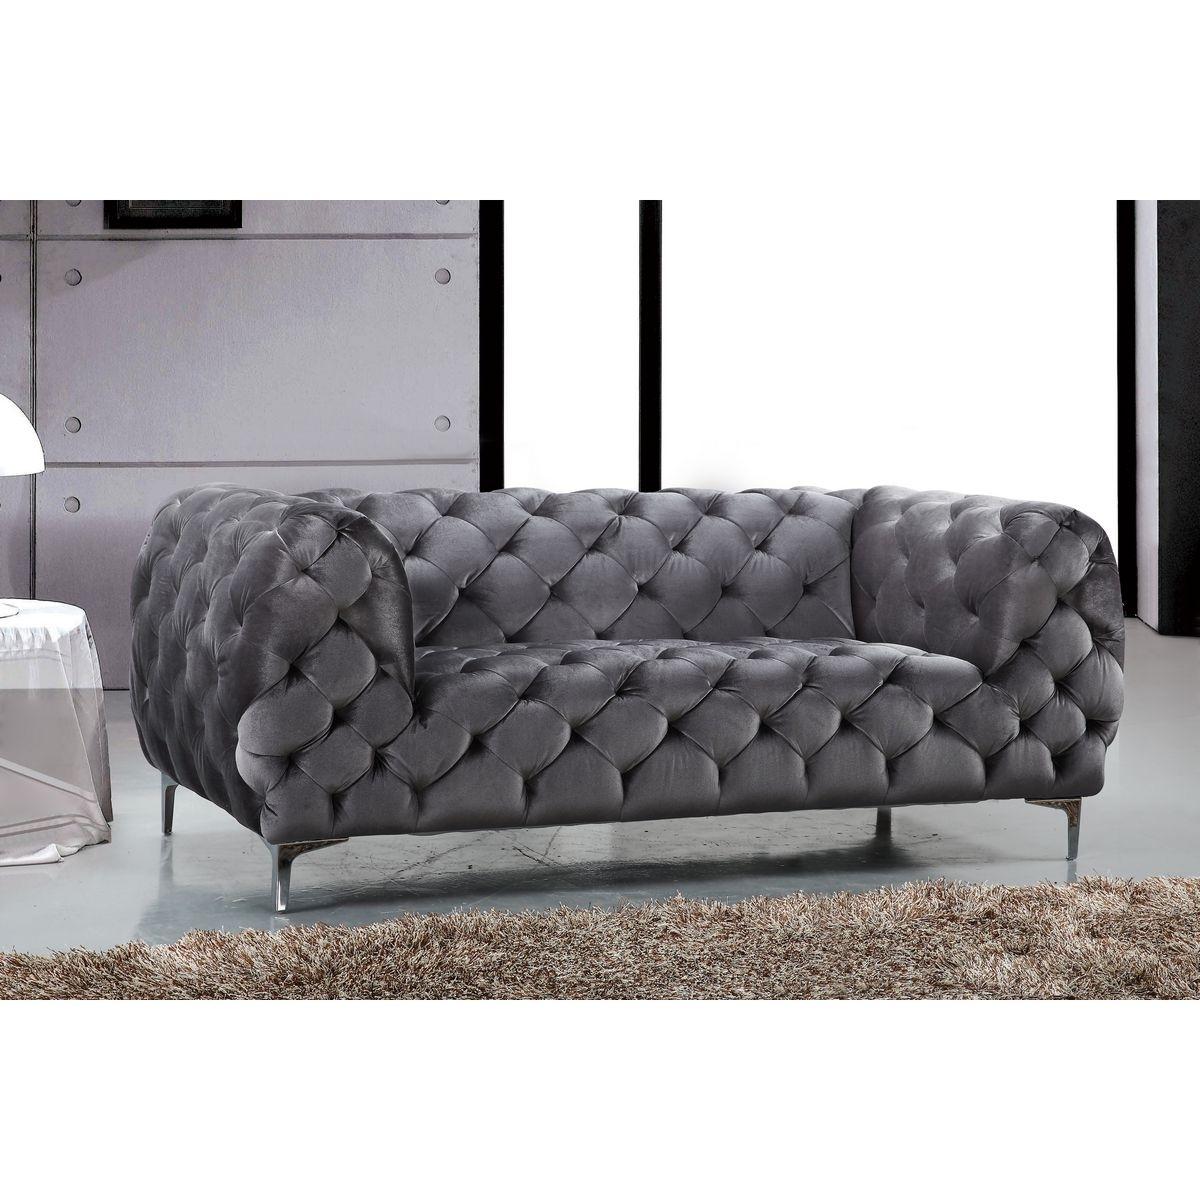 Furniture : Reclining Sofa Kijiji London Chesterfield Sofa Feet Inside Fashionable Kijiji London Sectional Sofas (View 6 of 20)